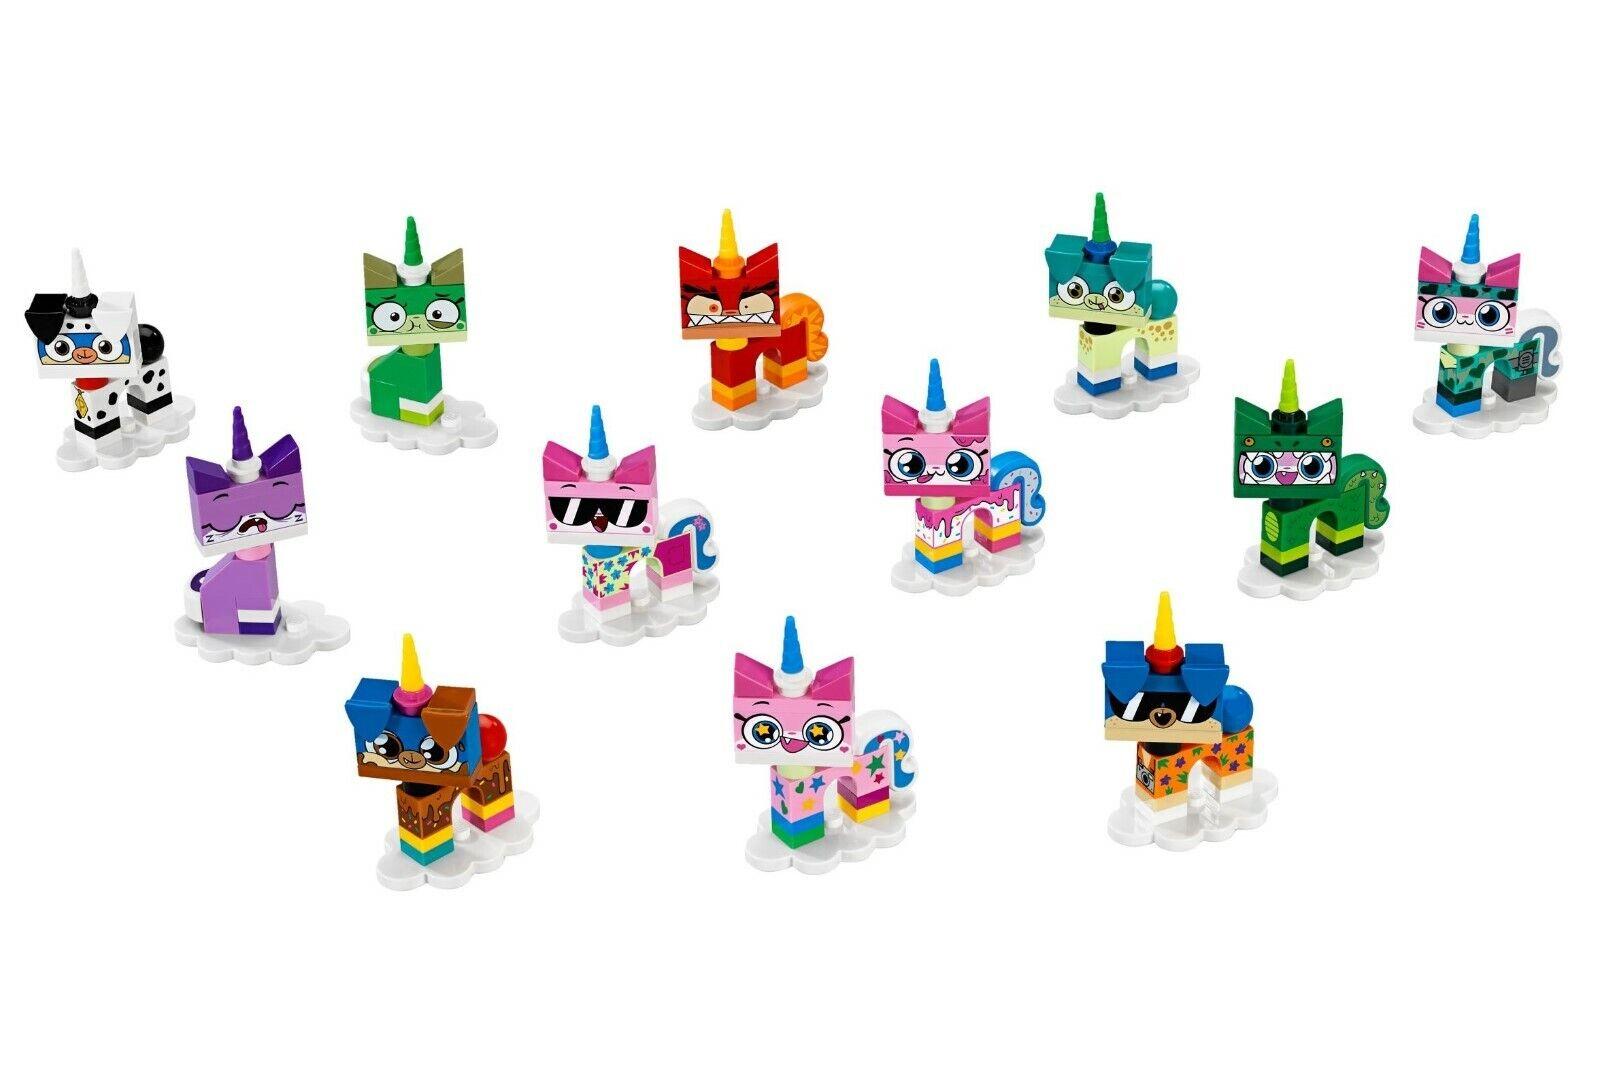 2018 Lego Minifigures Unikitty Series  1 - Complete Set 12 Figures - MPN  41775